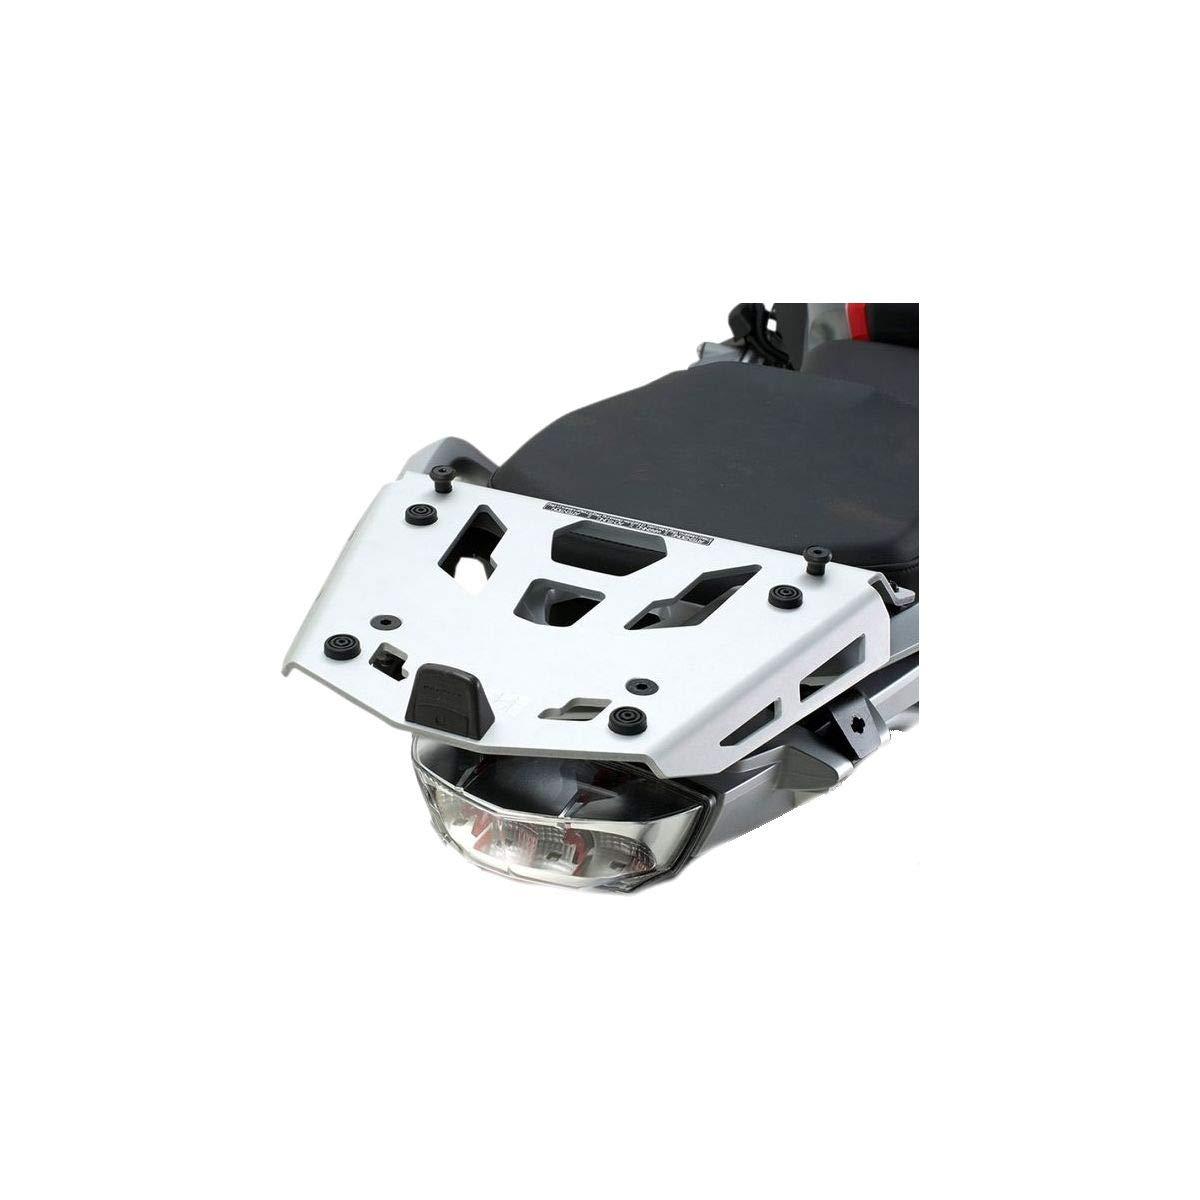 Givi Support Top Case Monokey Valise Honda Crosstourer 1200 Aluminium